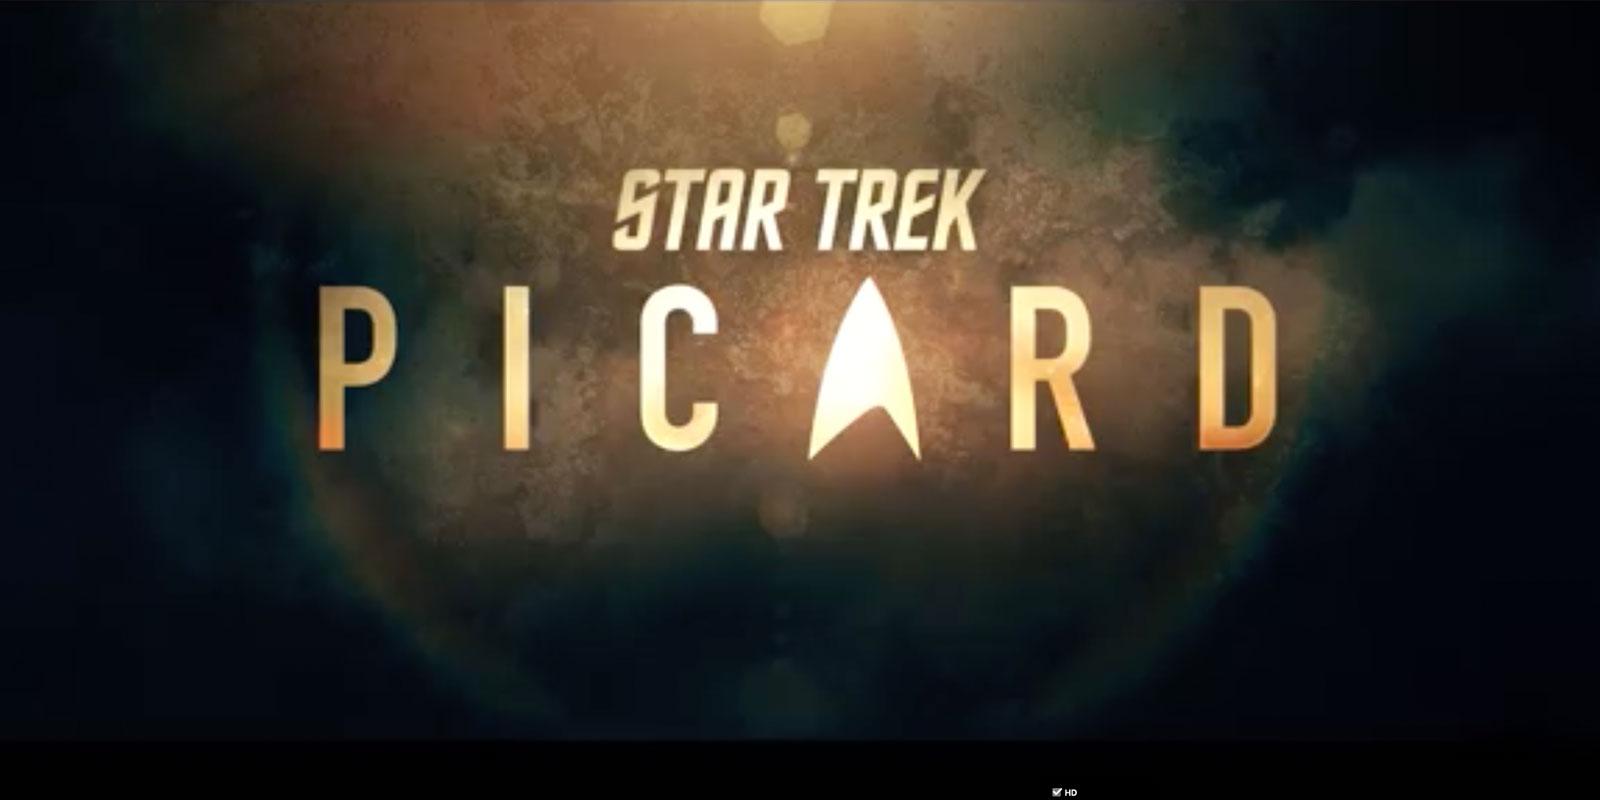 Star Trek: Picard logo